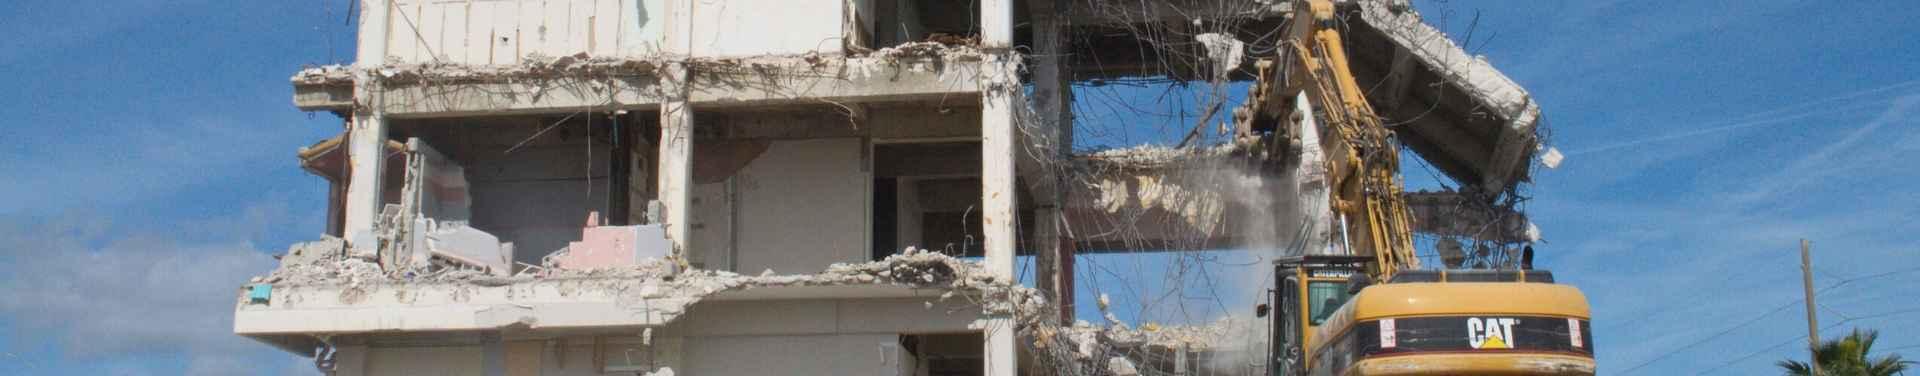 backhoe demolishing a commercial building